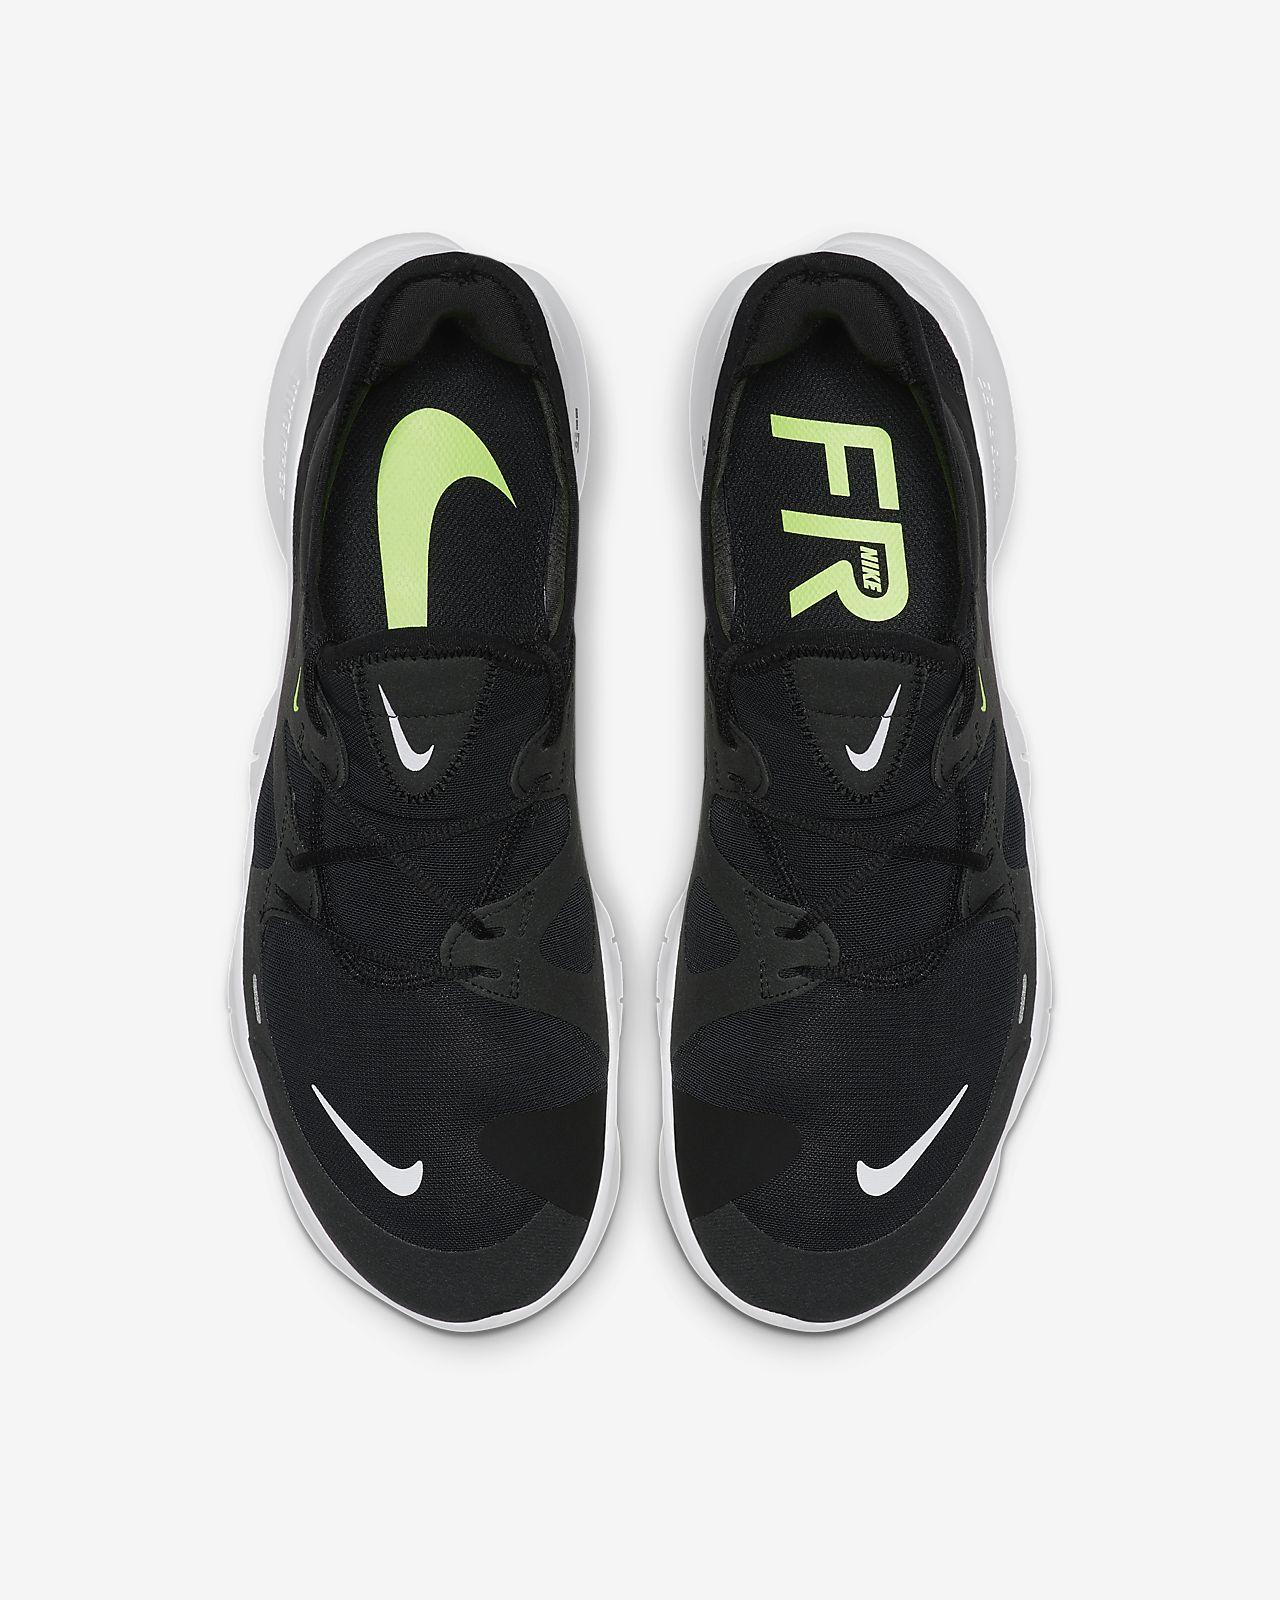 estilo máximo buscar original moderno y elegante en moda Nike Free RN 5.0 Men's Running Shoe. Nike ID